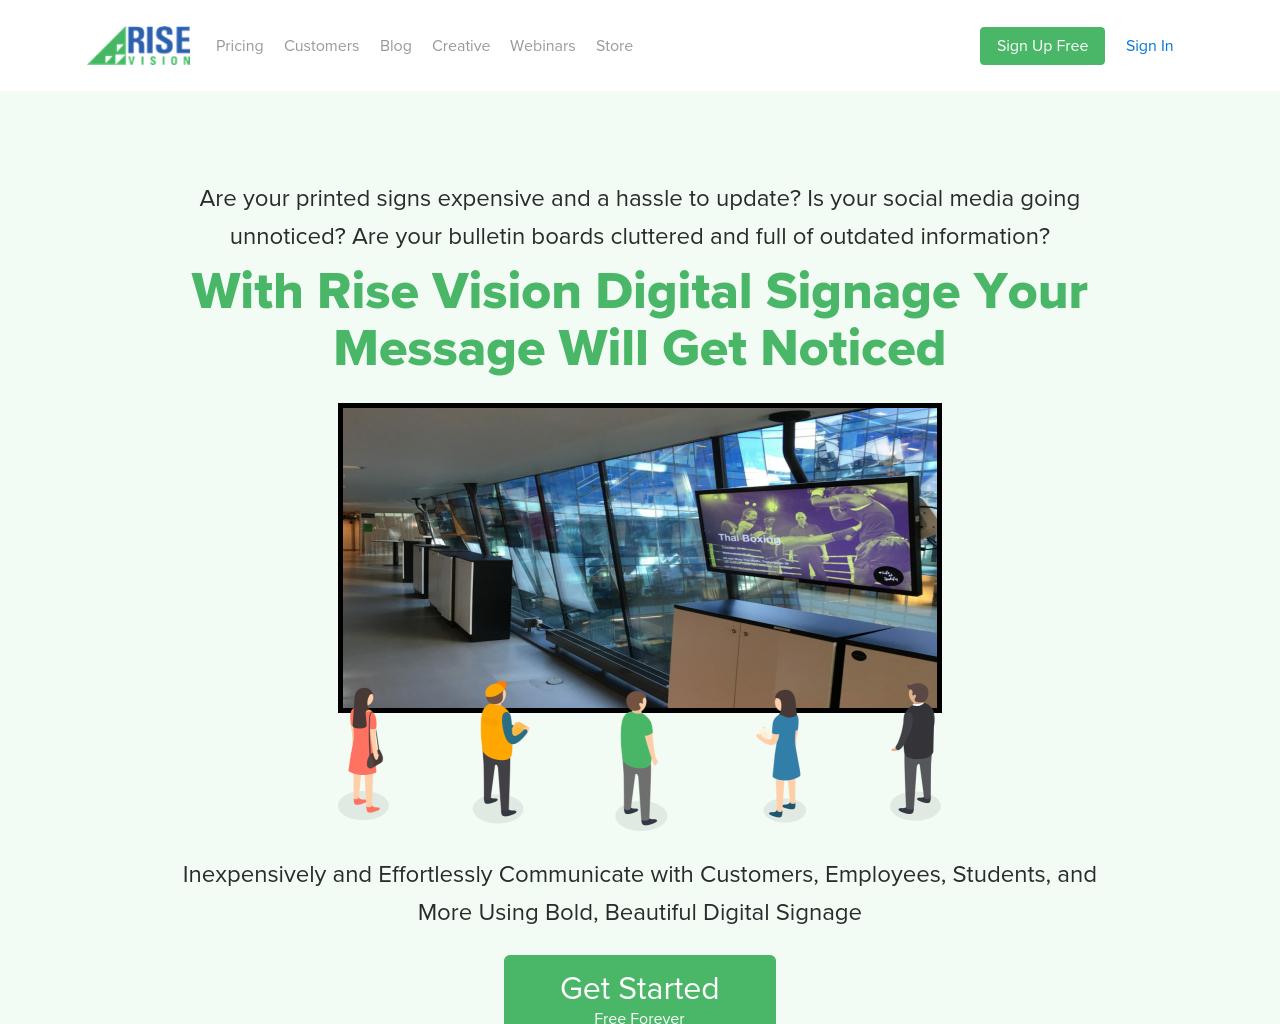 Rise-Vision-Advertising-Reviews-Pricing